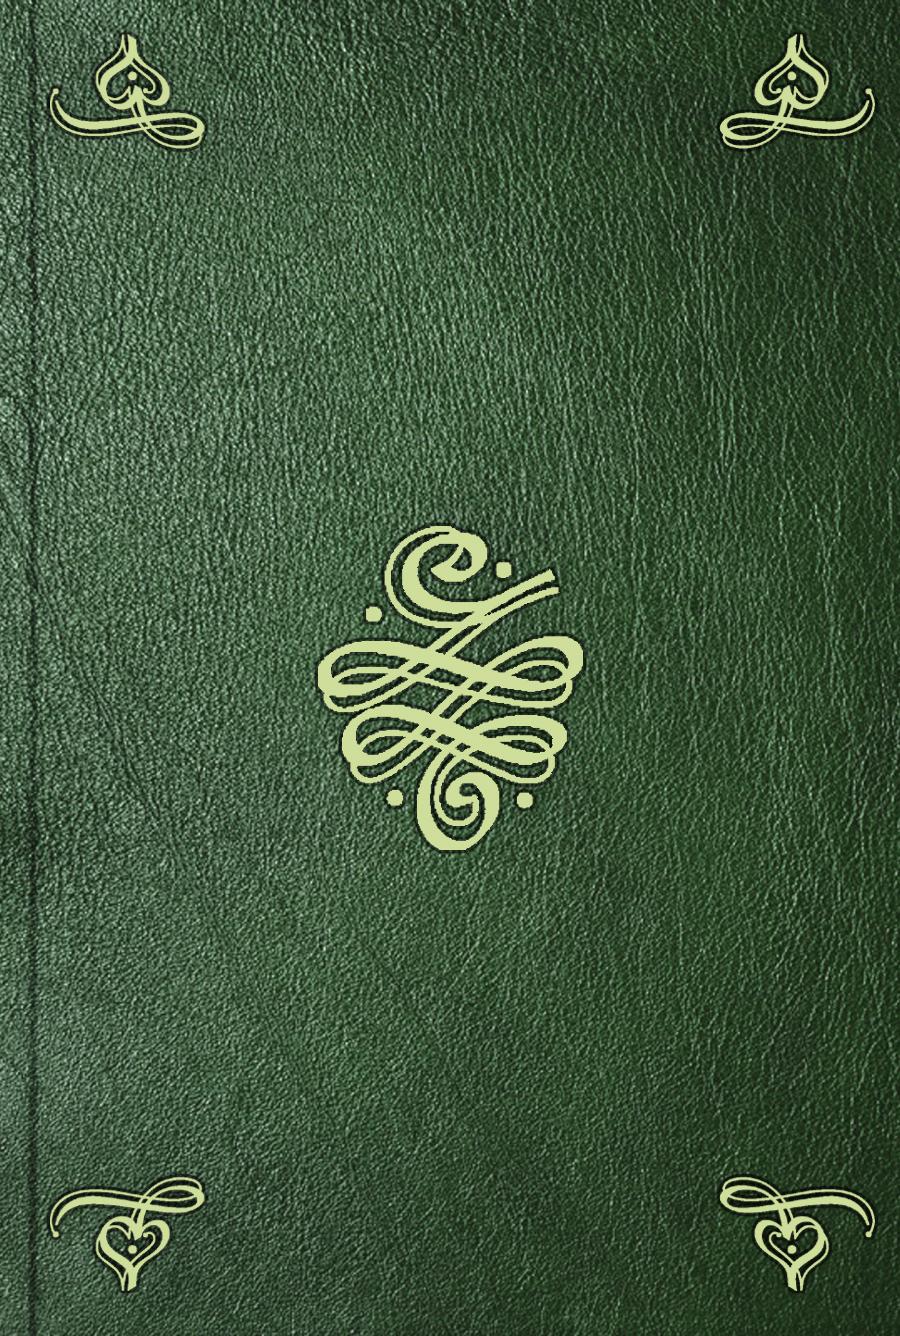 Moses Mendelssohn Moses Mendelssohns Philosophische Schriften. T. 2 j keats hyperion mit einleitung hrsg von johannes hoops